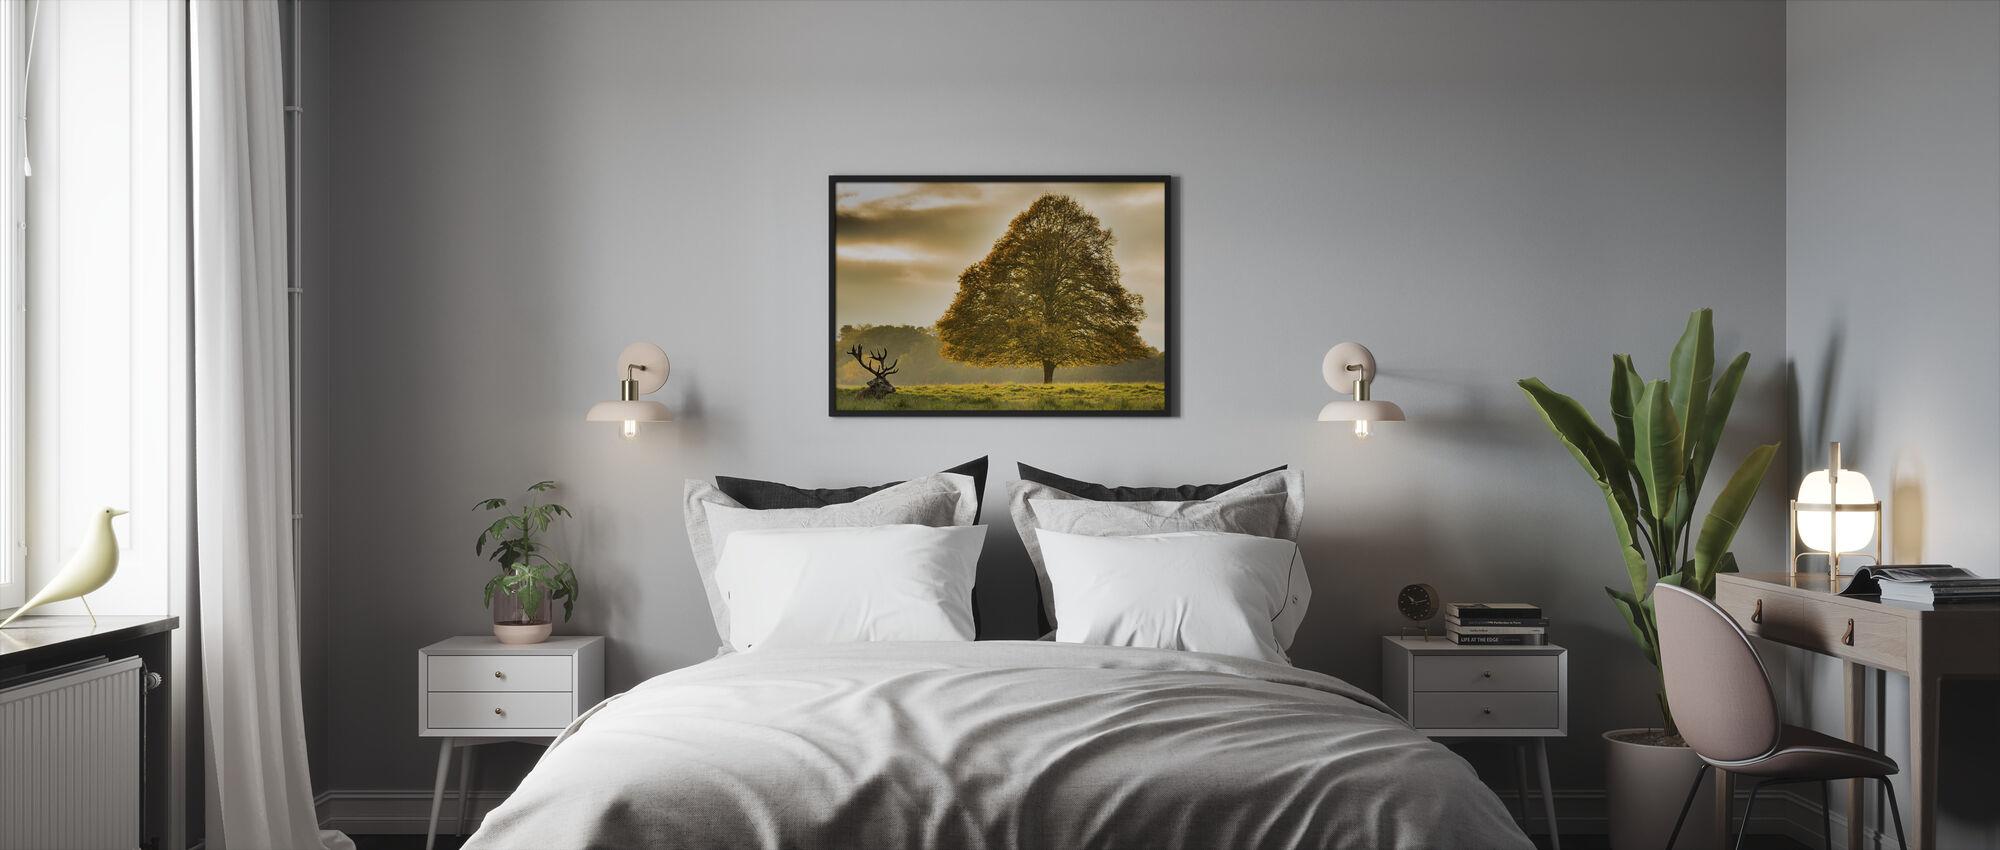 Deer and the Tree - Framed print - Bedroom